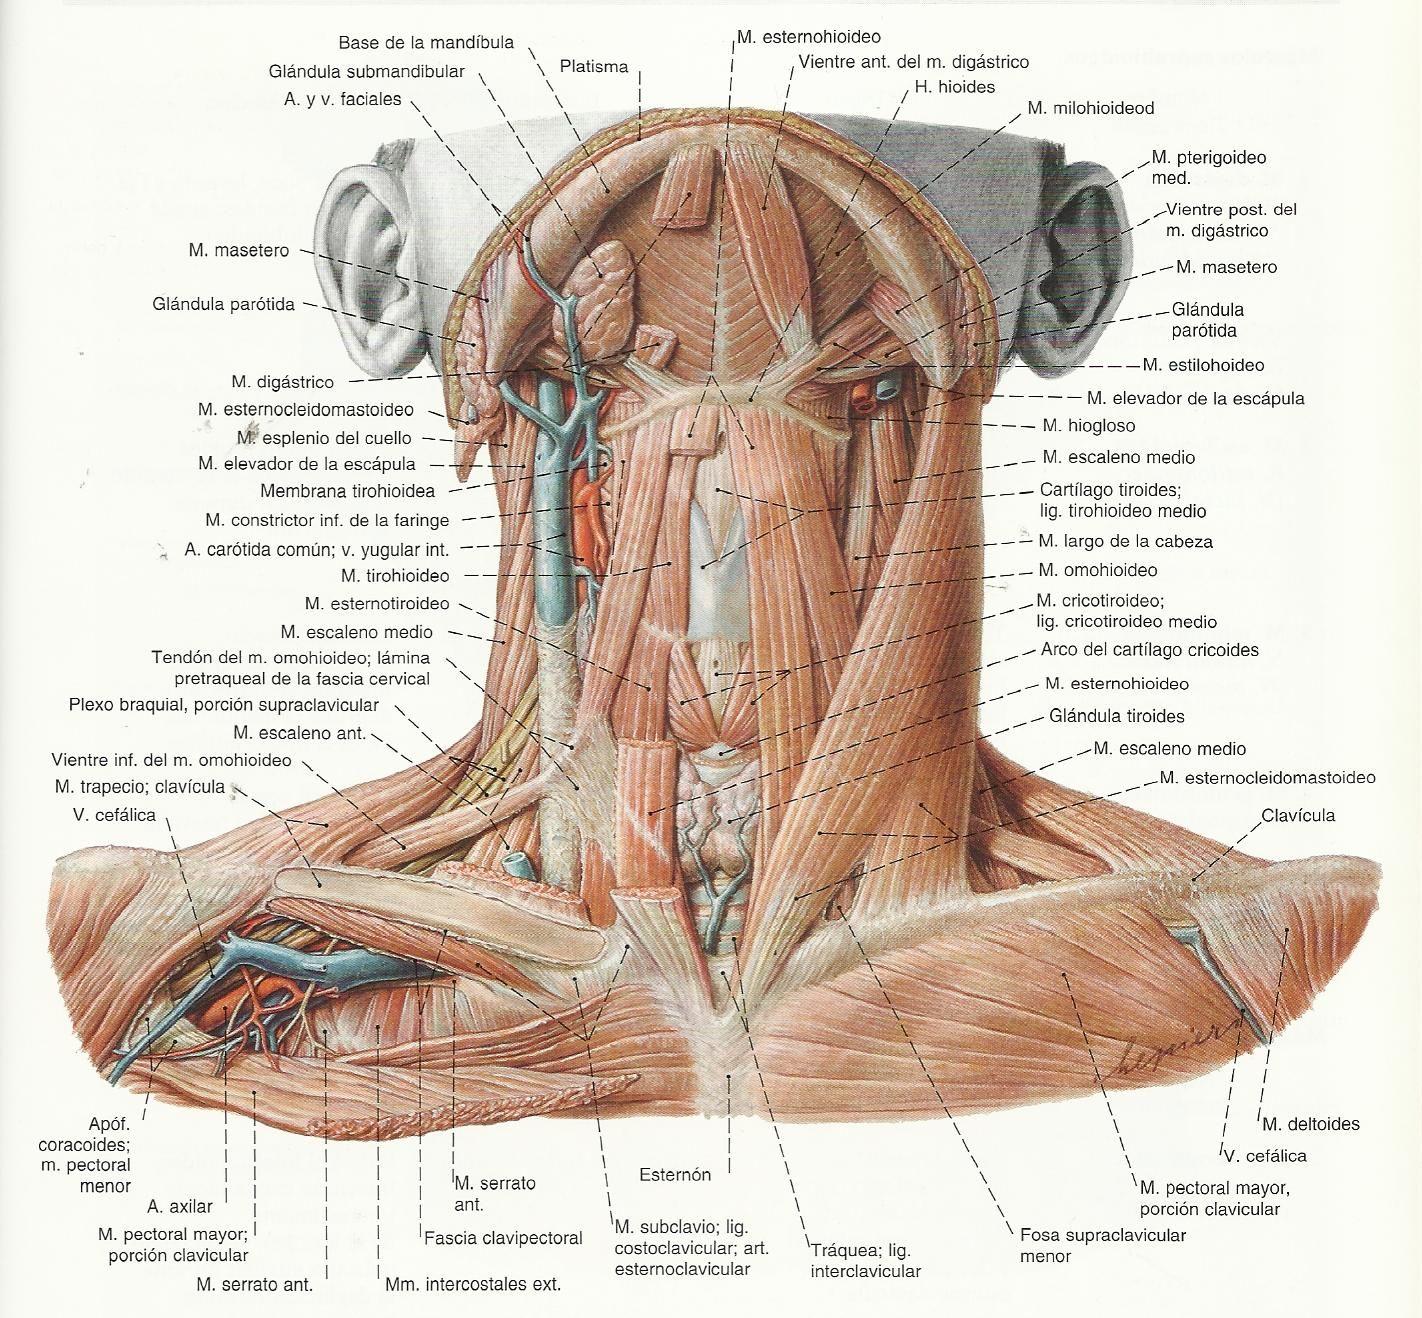 Excelente Anatomía Arco Cefálica Composición - Imágenes de Anatomía ...